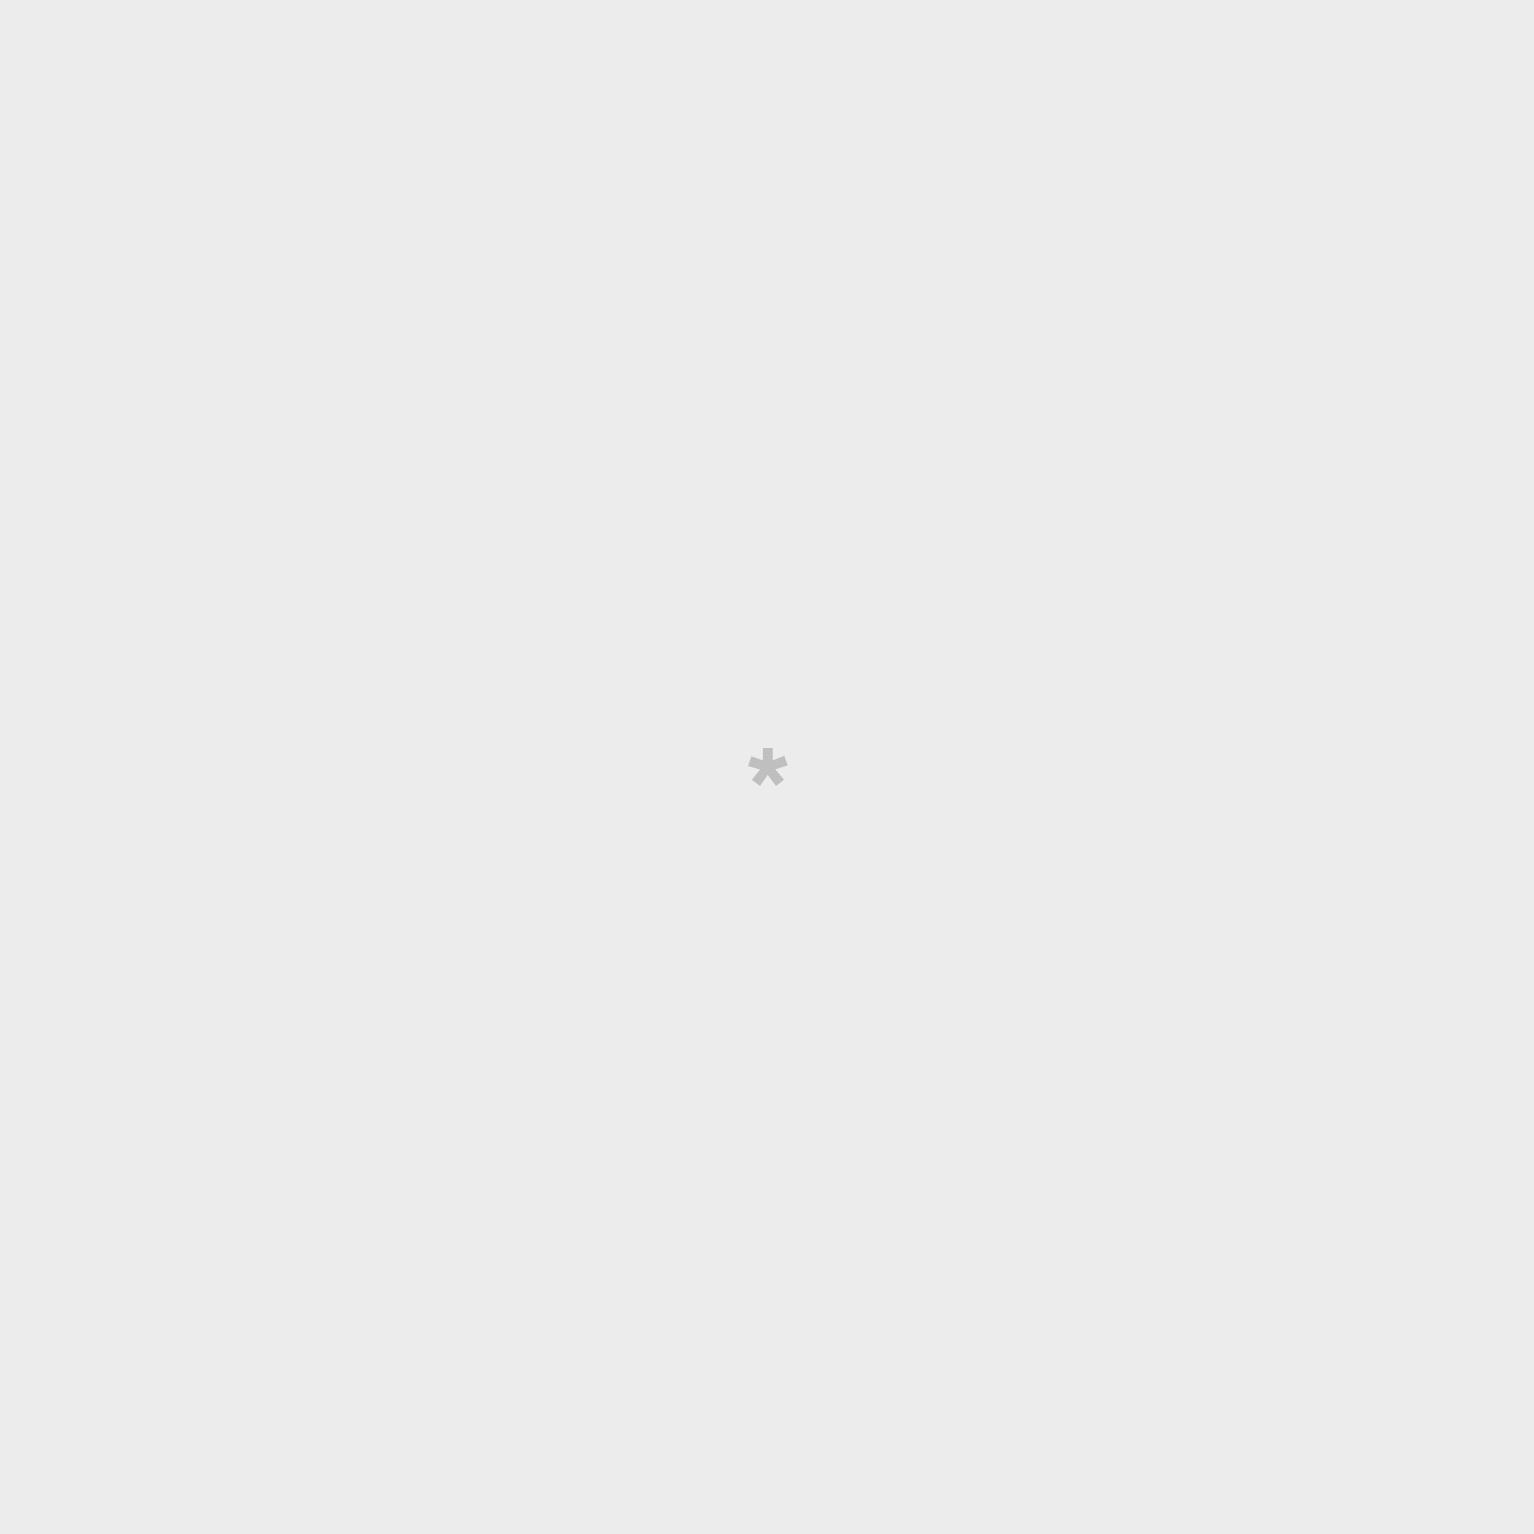 Notebook - Crazy ideas & other genius stuff